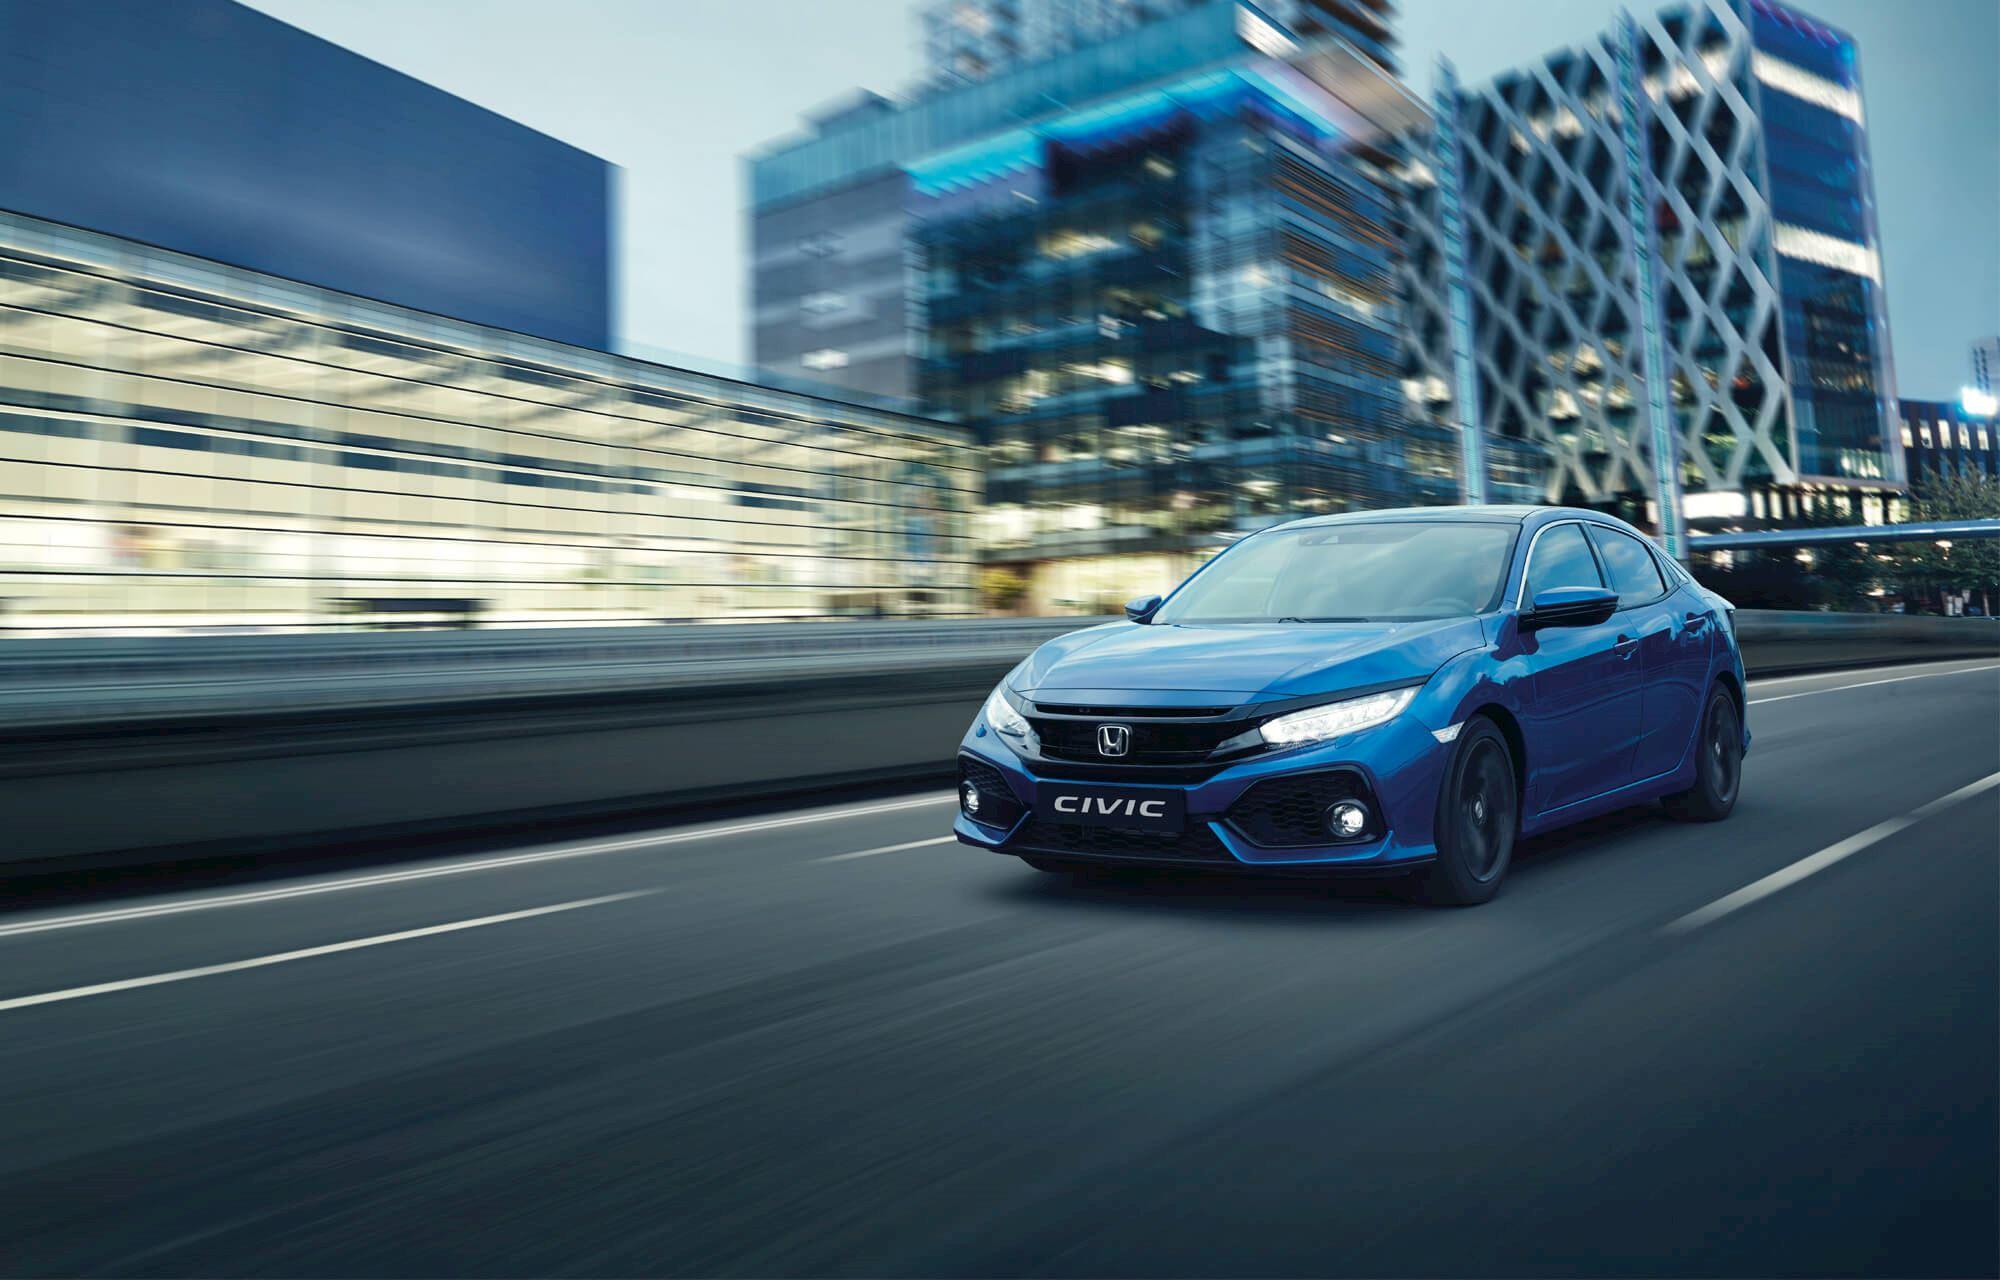 Honda Civic Hatchback available at Denis Kinane Motors